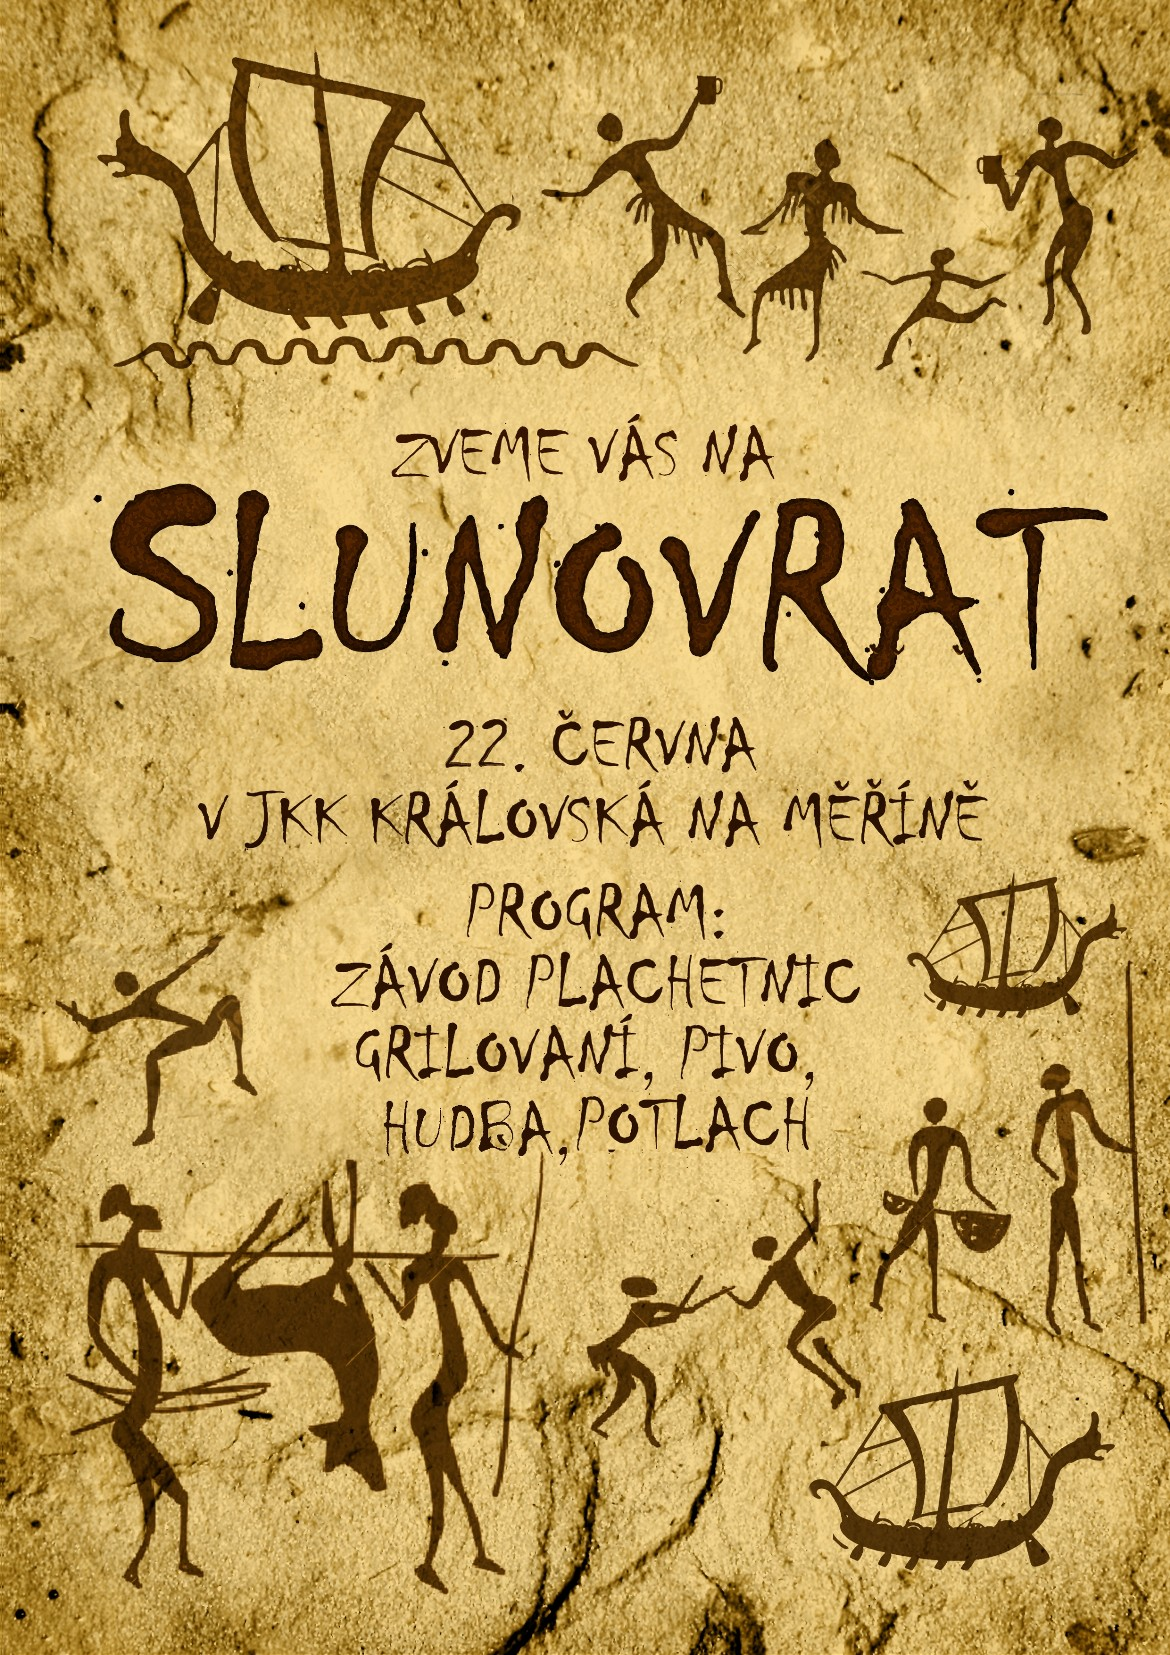 slunovrat plakat 2019